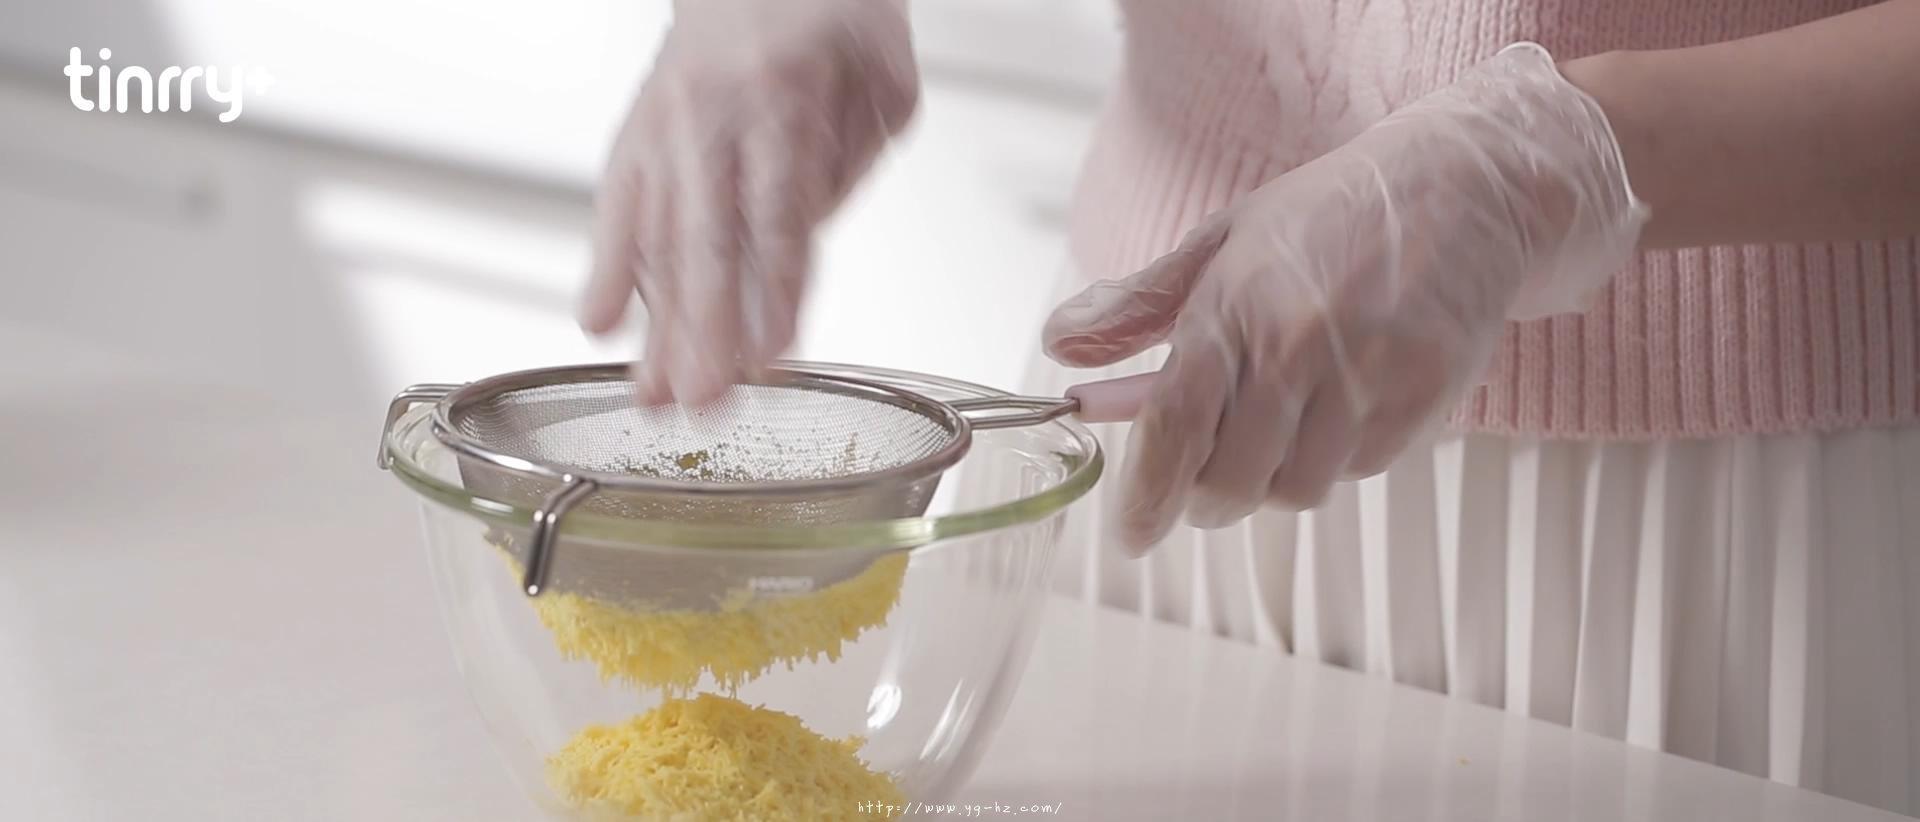 《Tinrry+》超香浓酥松的玛格丽特小饼干,入口即化的做法 步骤4